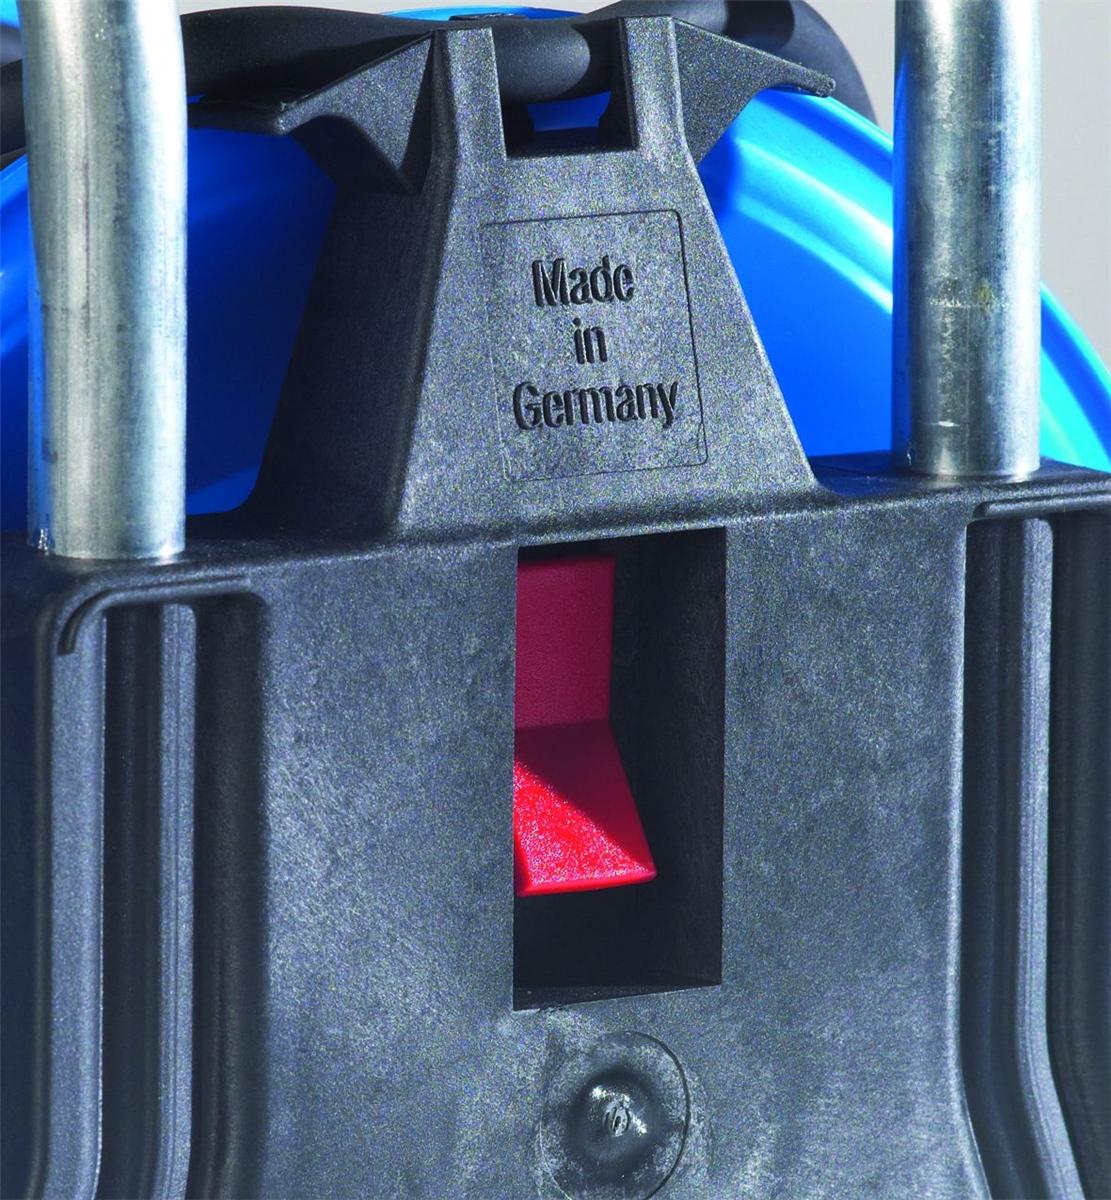 Hedi K2y000tfc Kunststoff Kabeltrommel Camping Leer